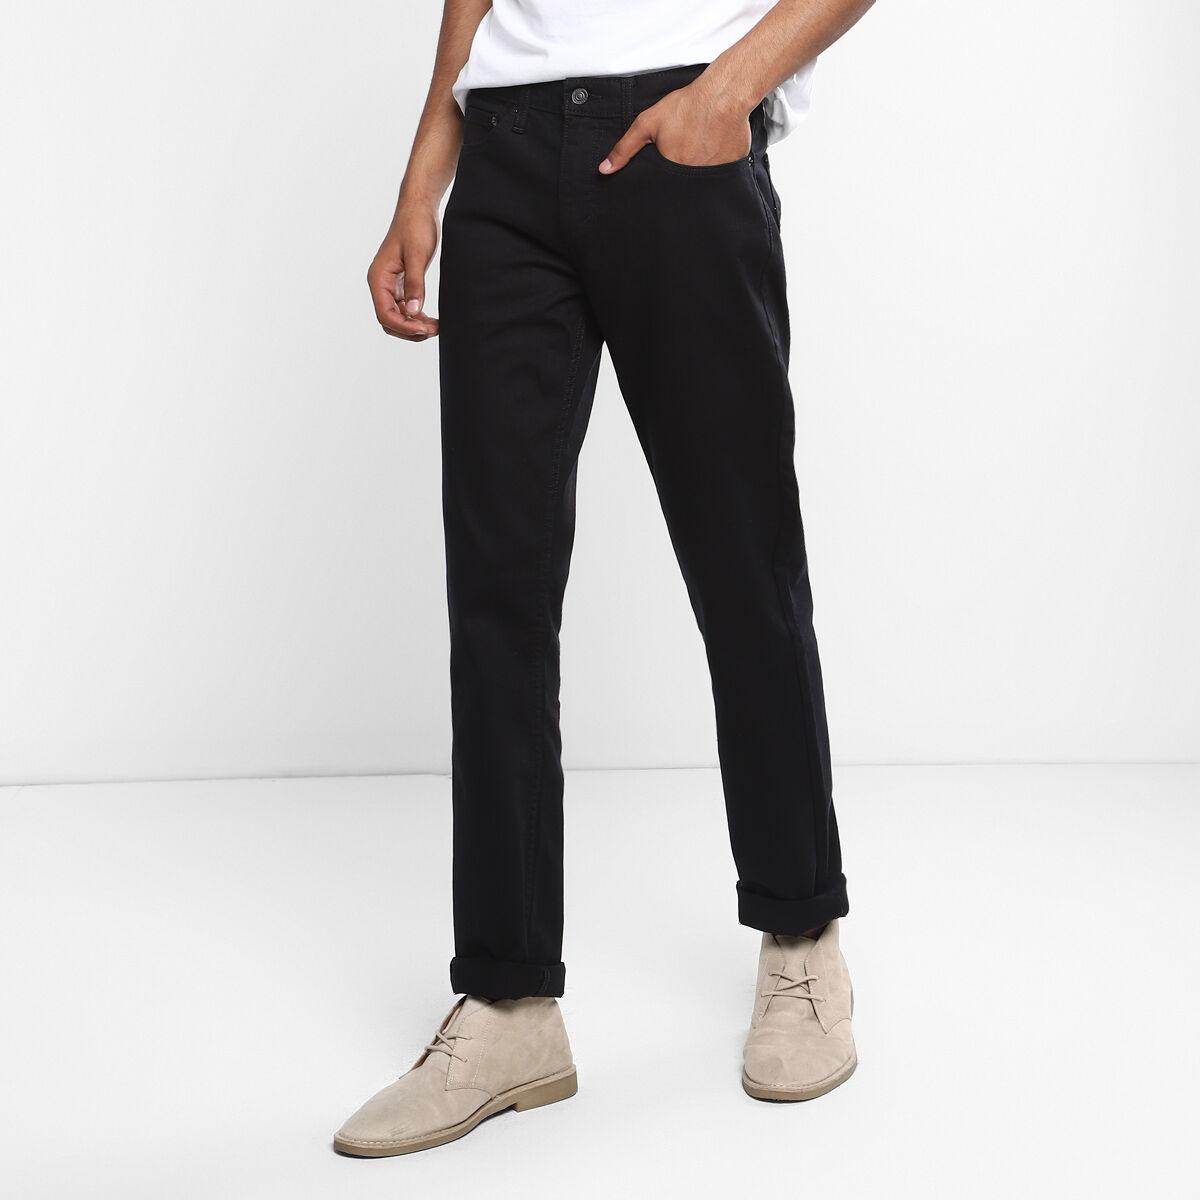 Levi's® Jeans for Men | Levi's® India